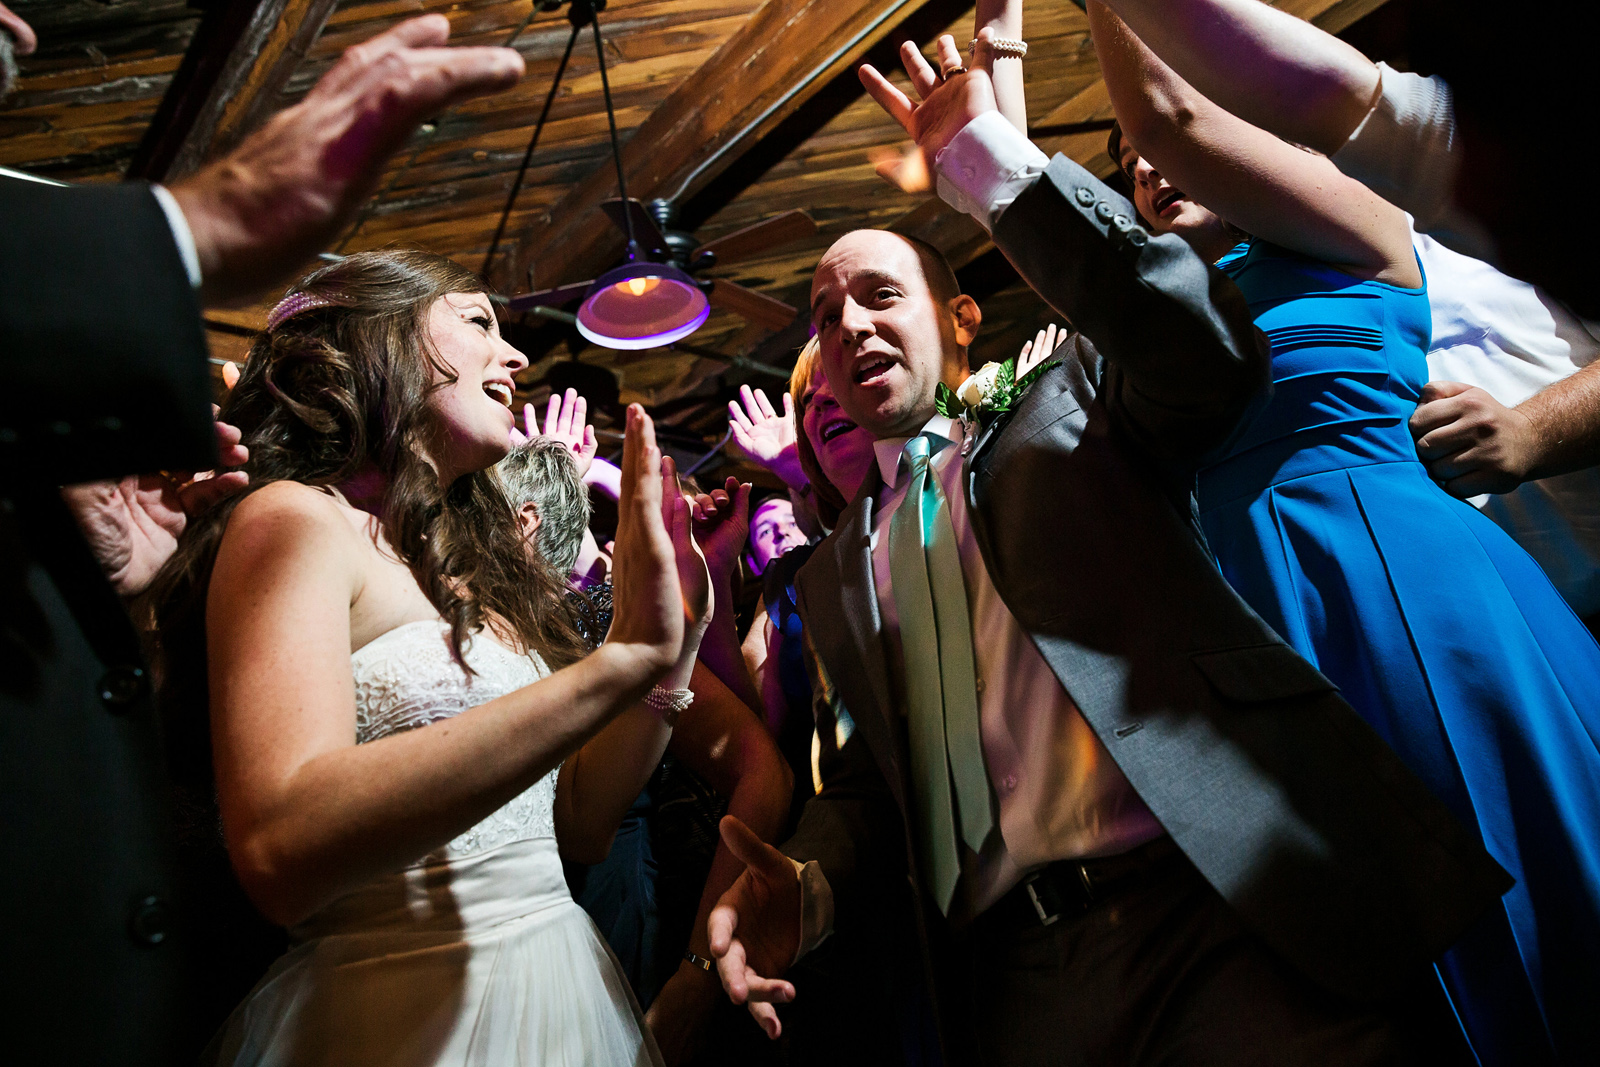 Oldani-Photography-St-Louis-Film-photographer-Schlafly-Tap-Room-Wedding-Reception_20140927_19491826.jpg